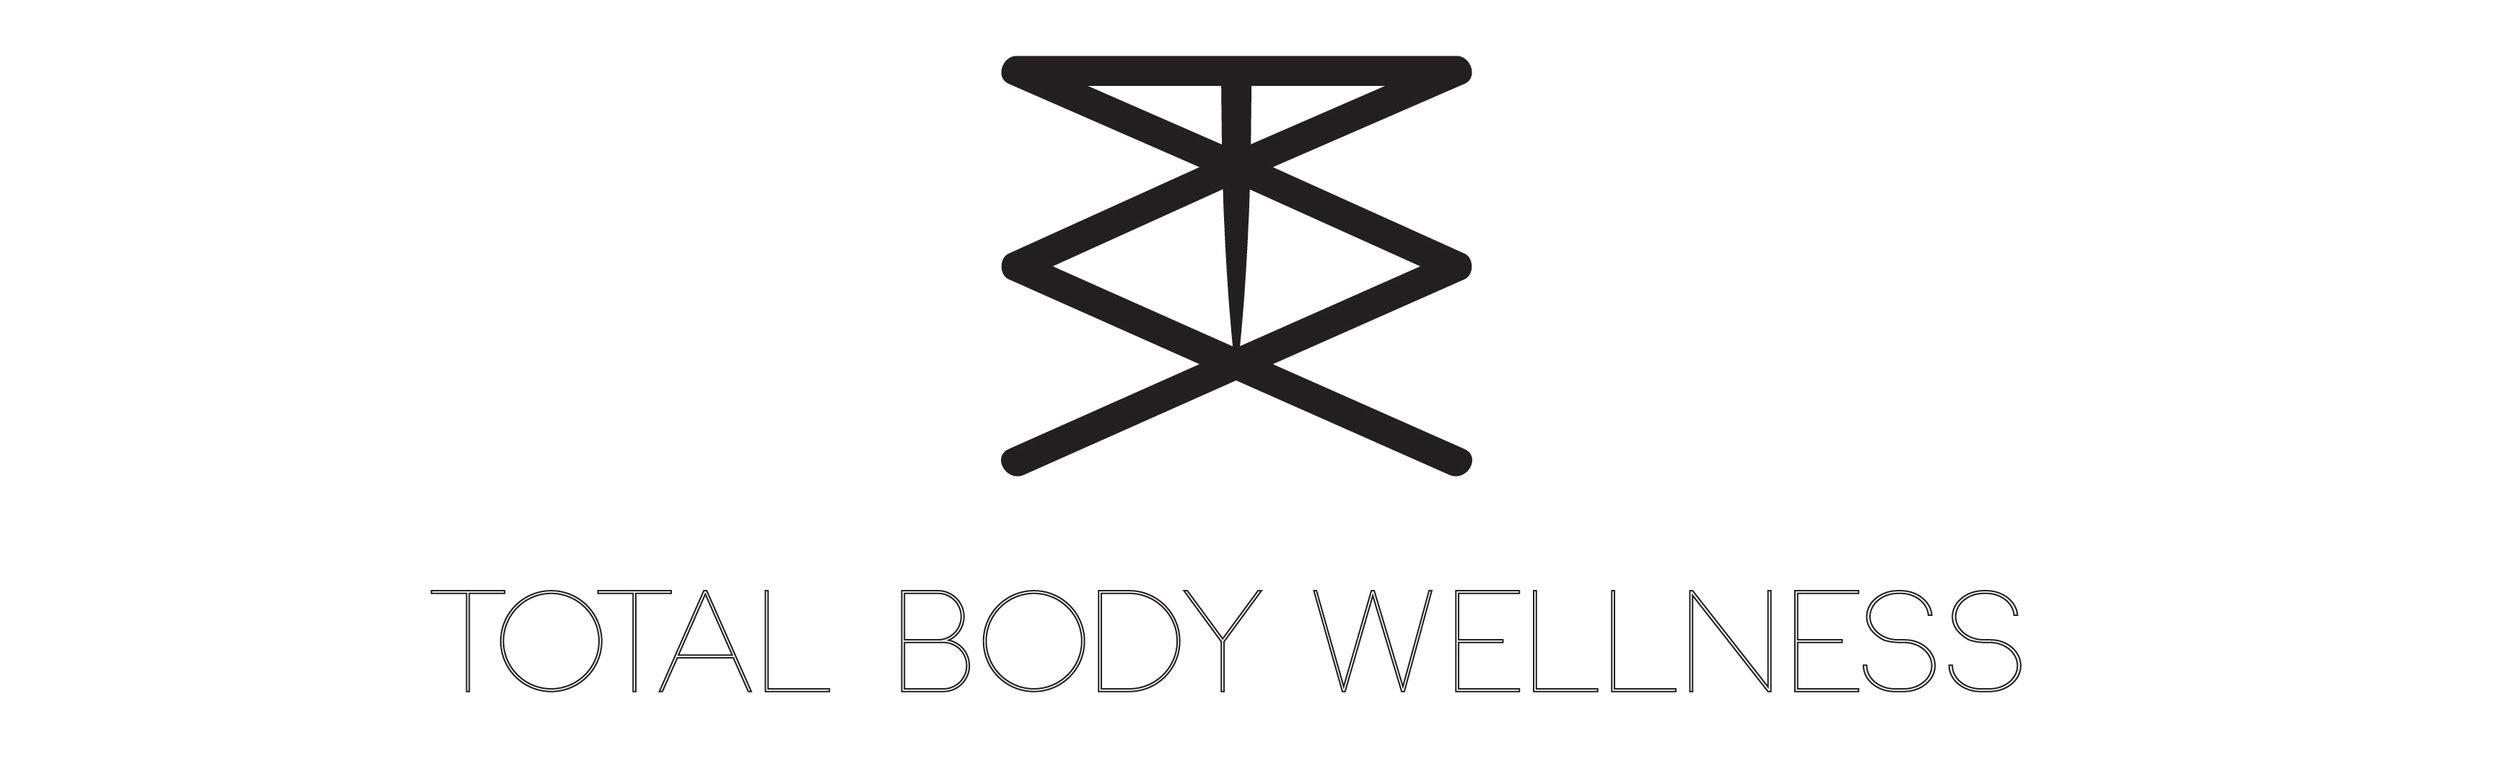 Total Body Wellness Denver